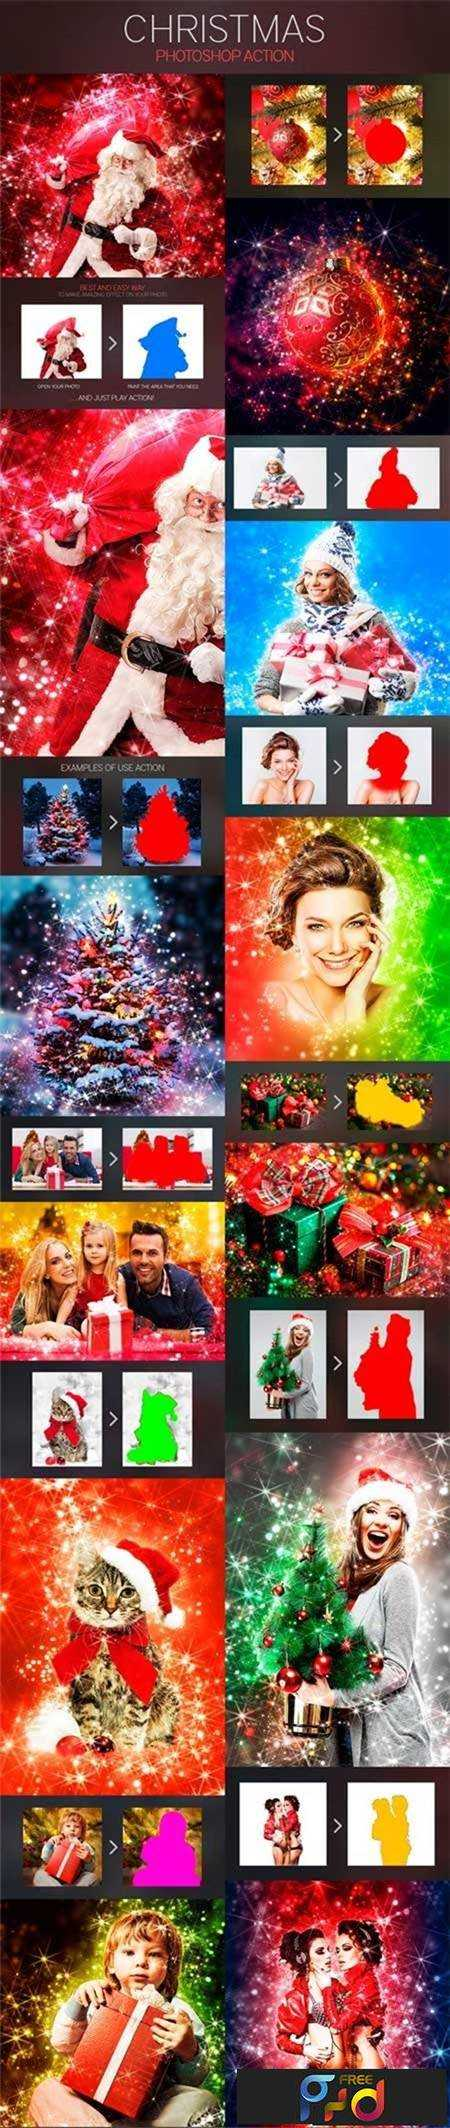 FreePsdVn.com_1702282_PHOTOSHOP_christmas_photoshop_action_9409331